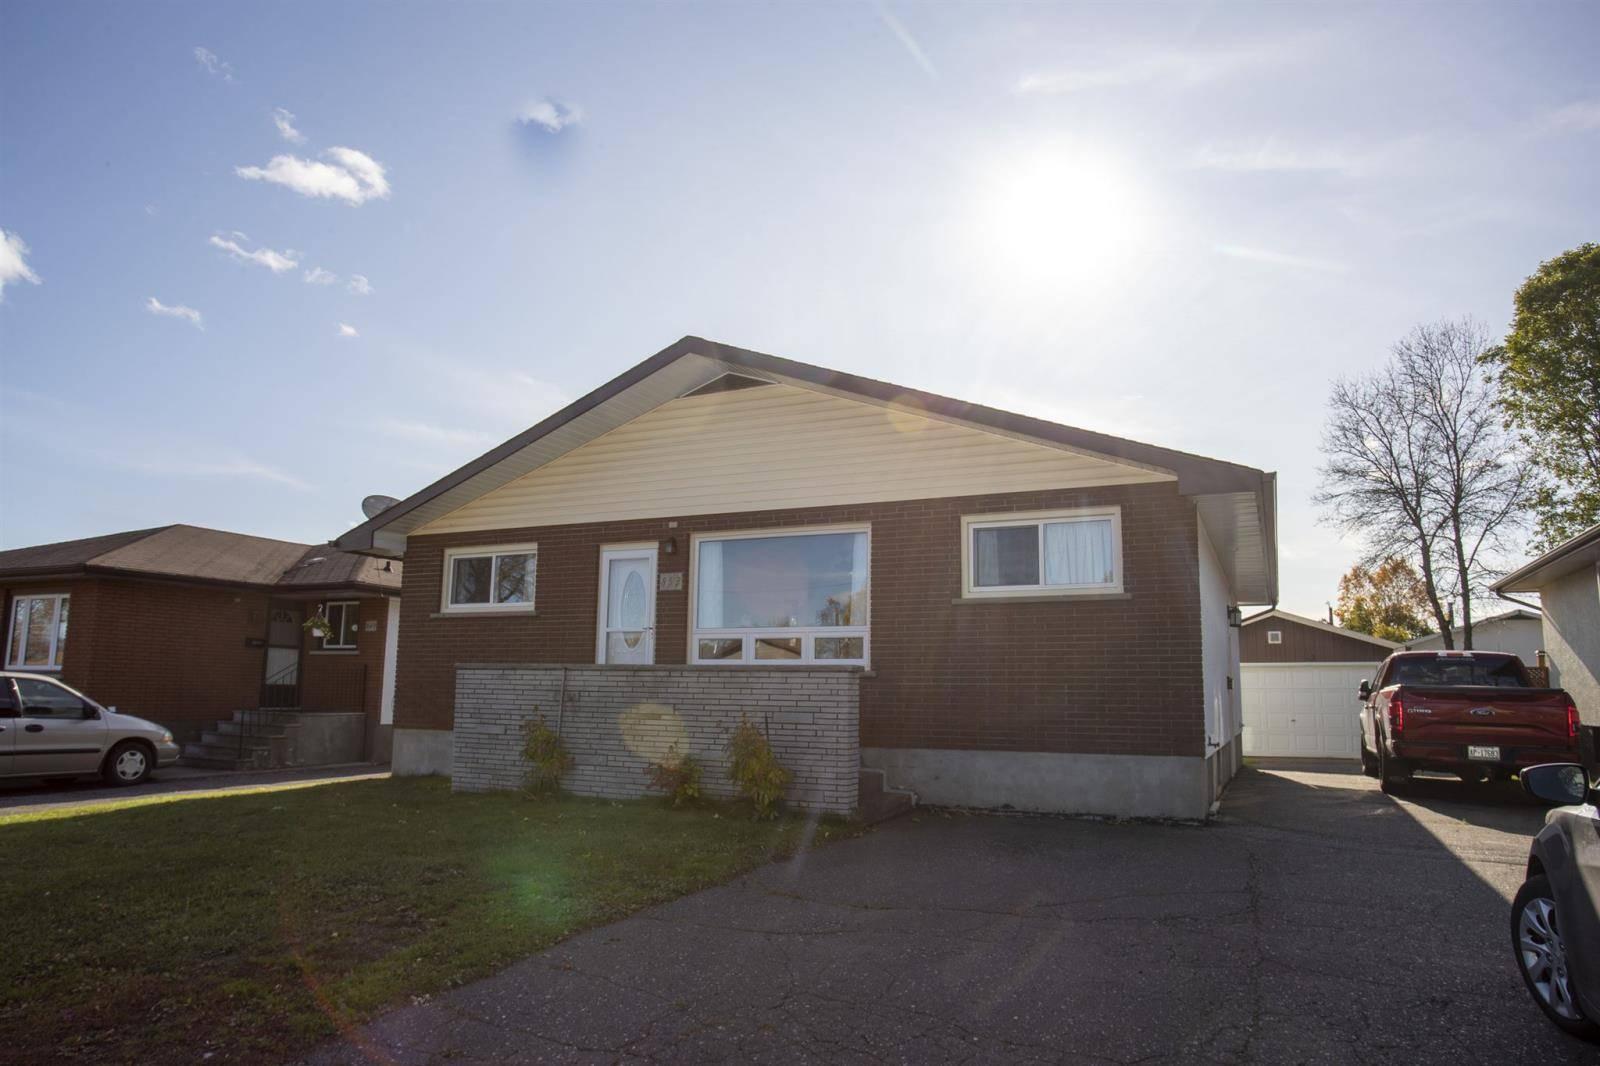 House for sale at 853 John St Thunder Bay Ontario - MLS: TB193374